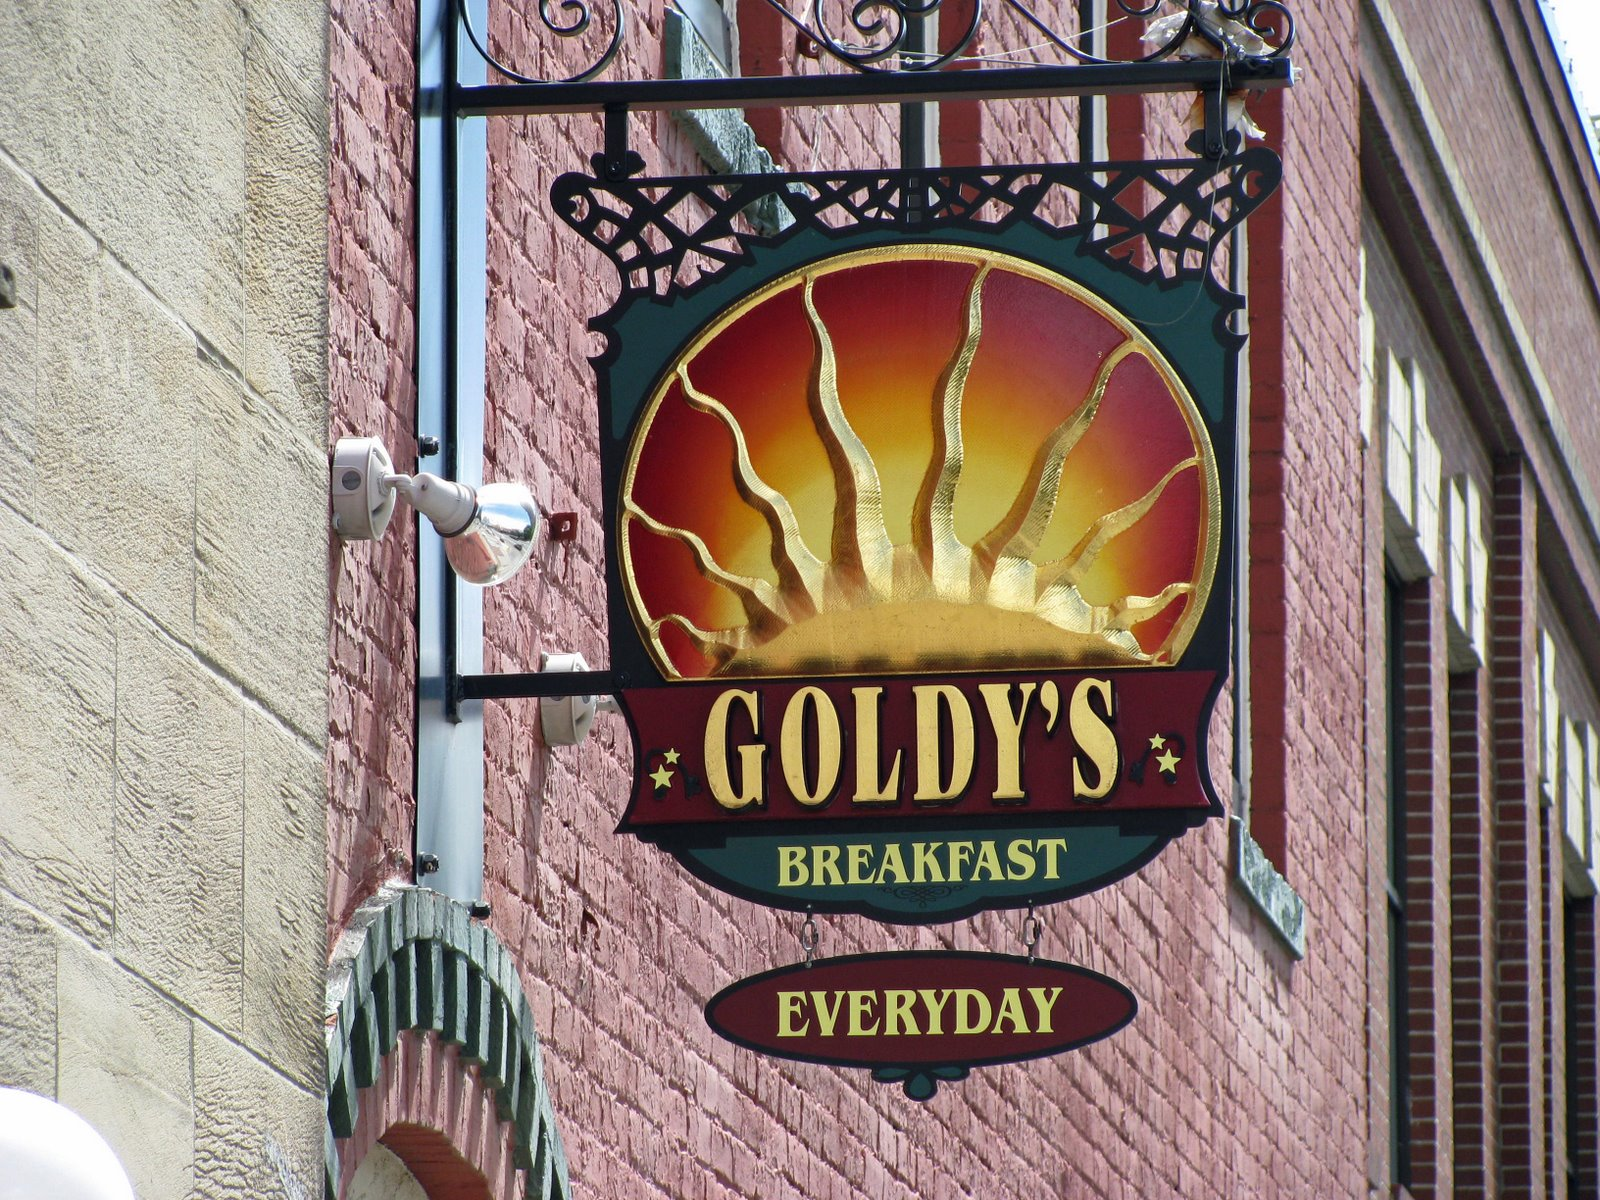 [Goldy]